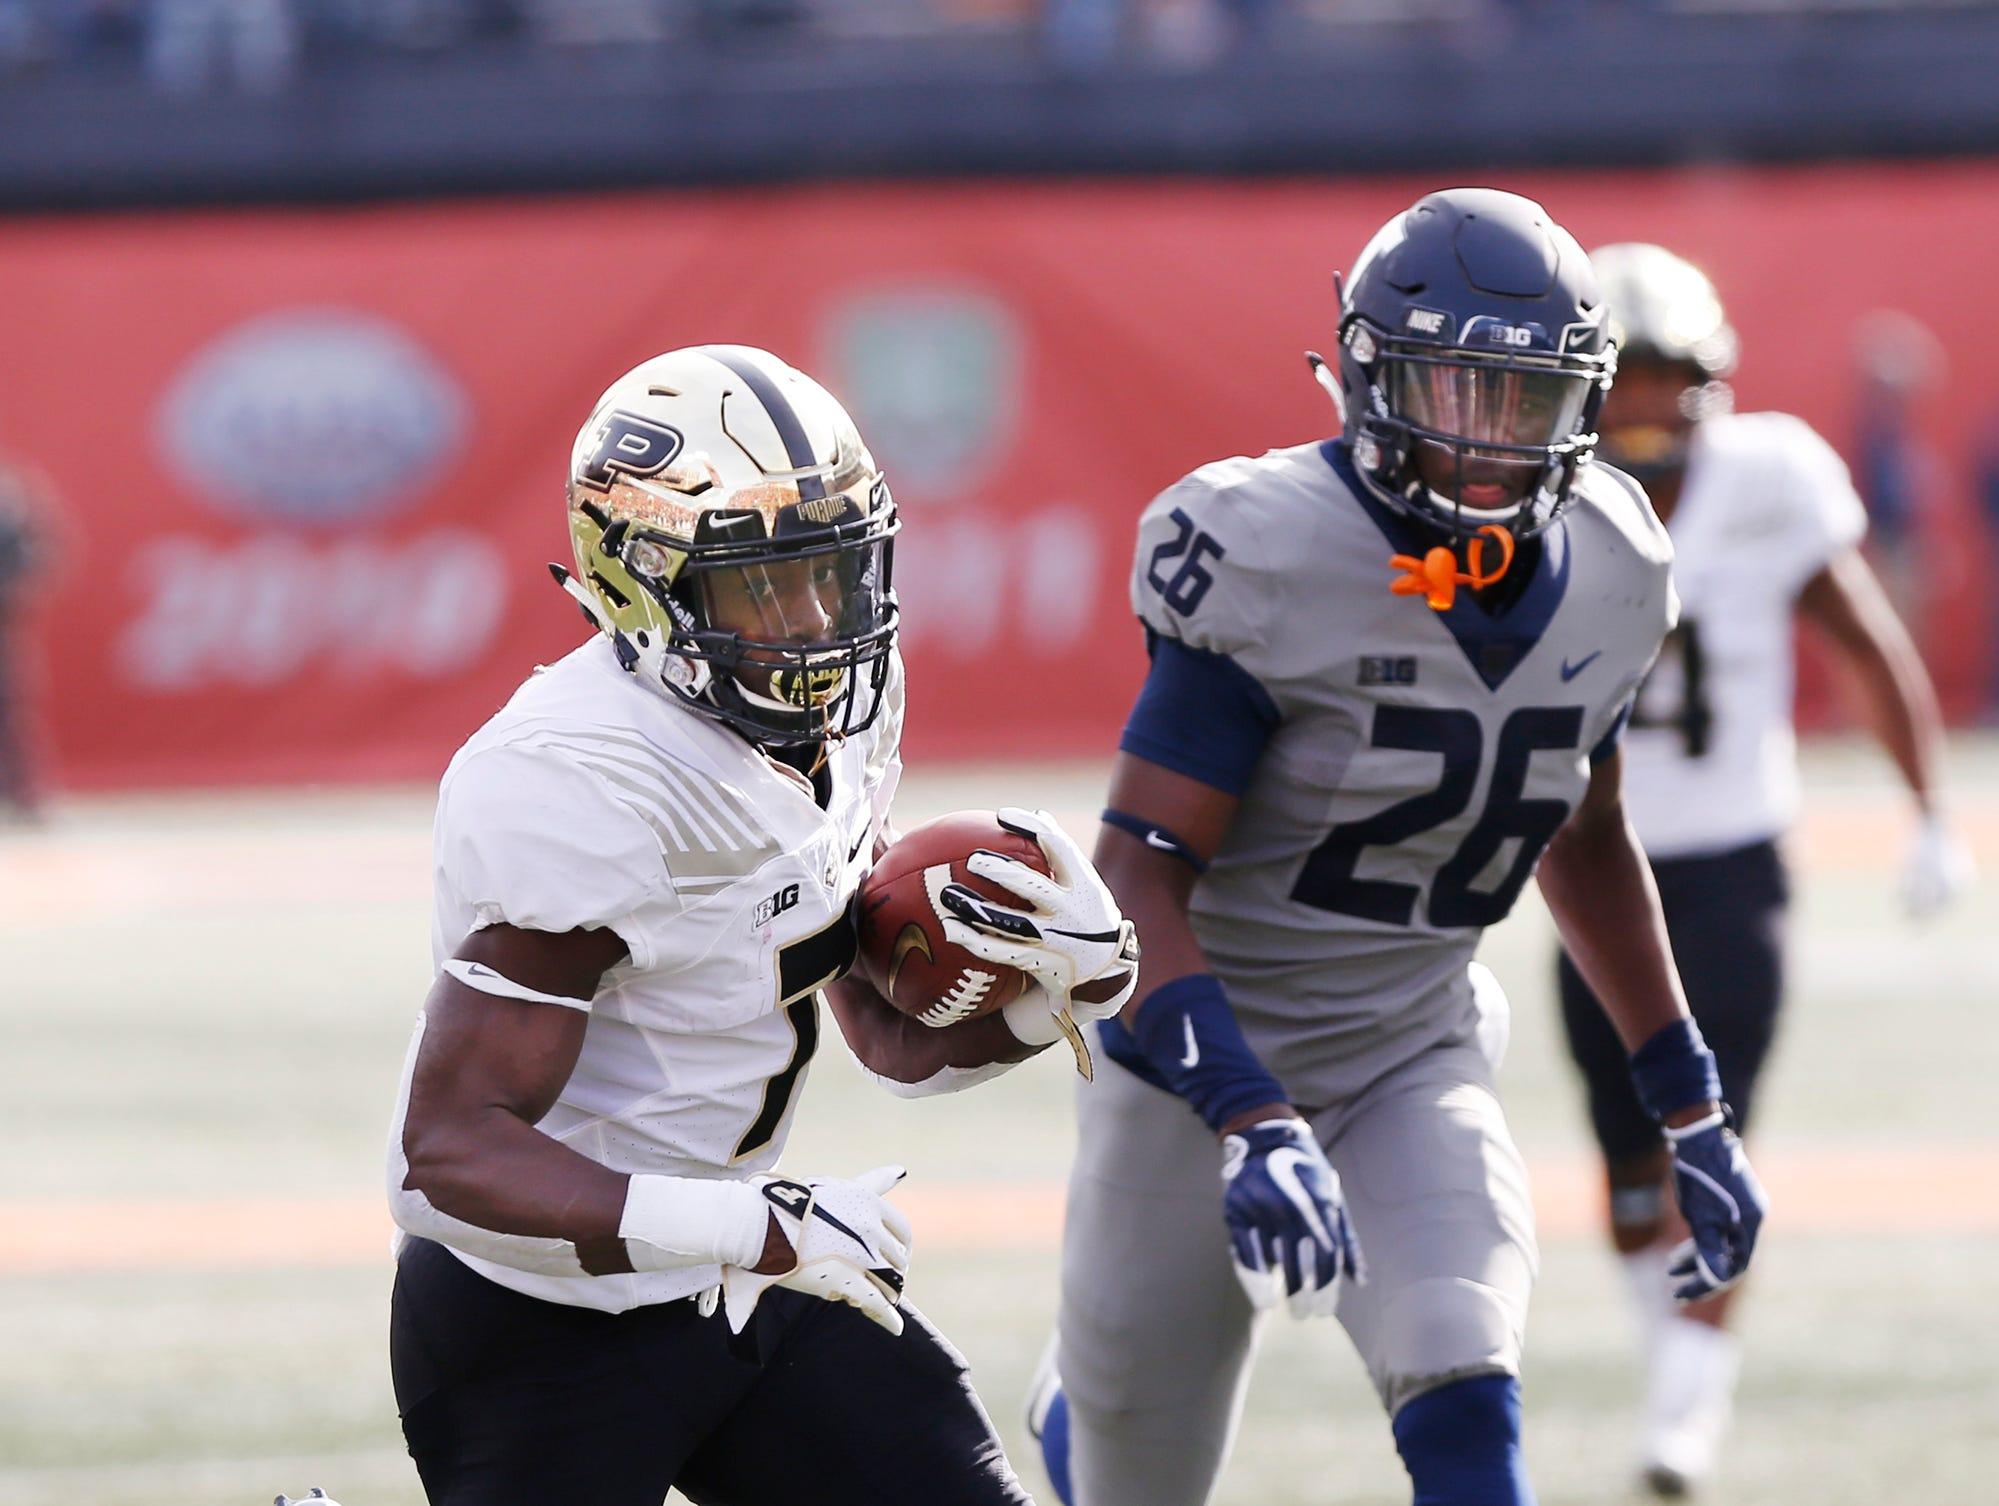 Purdue football 46, Illinois 7 | 5 takeaways